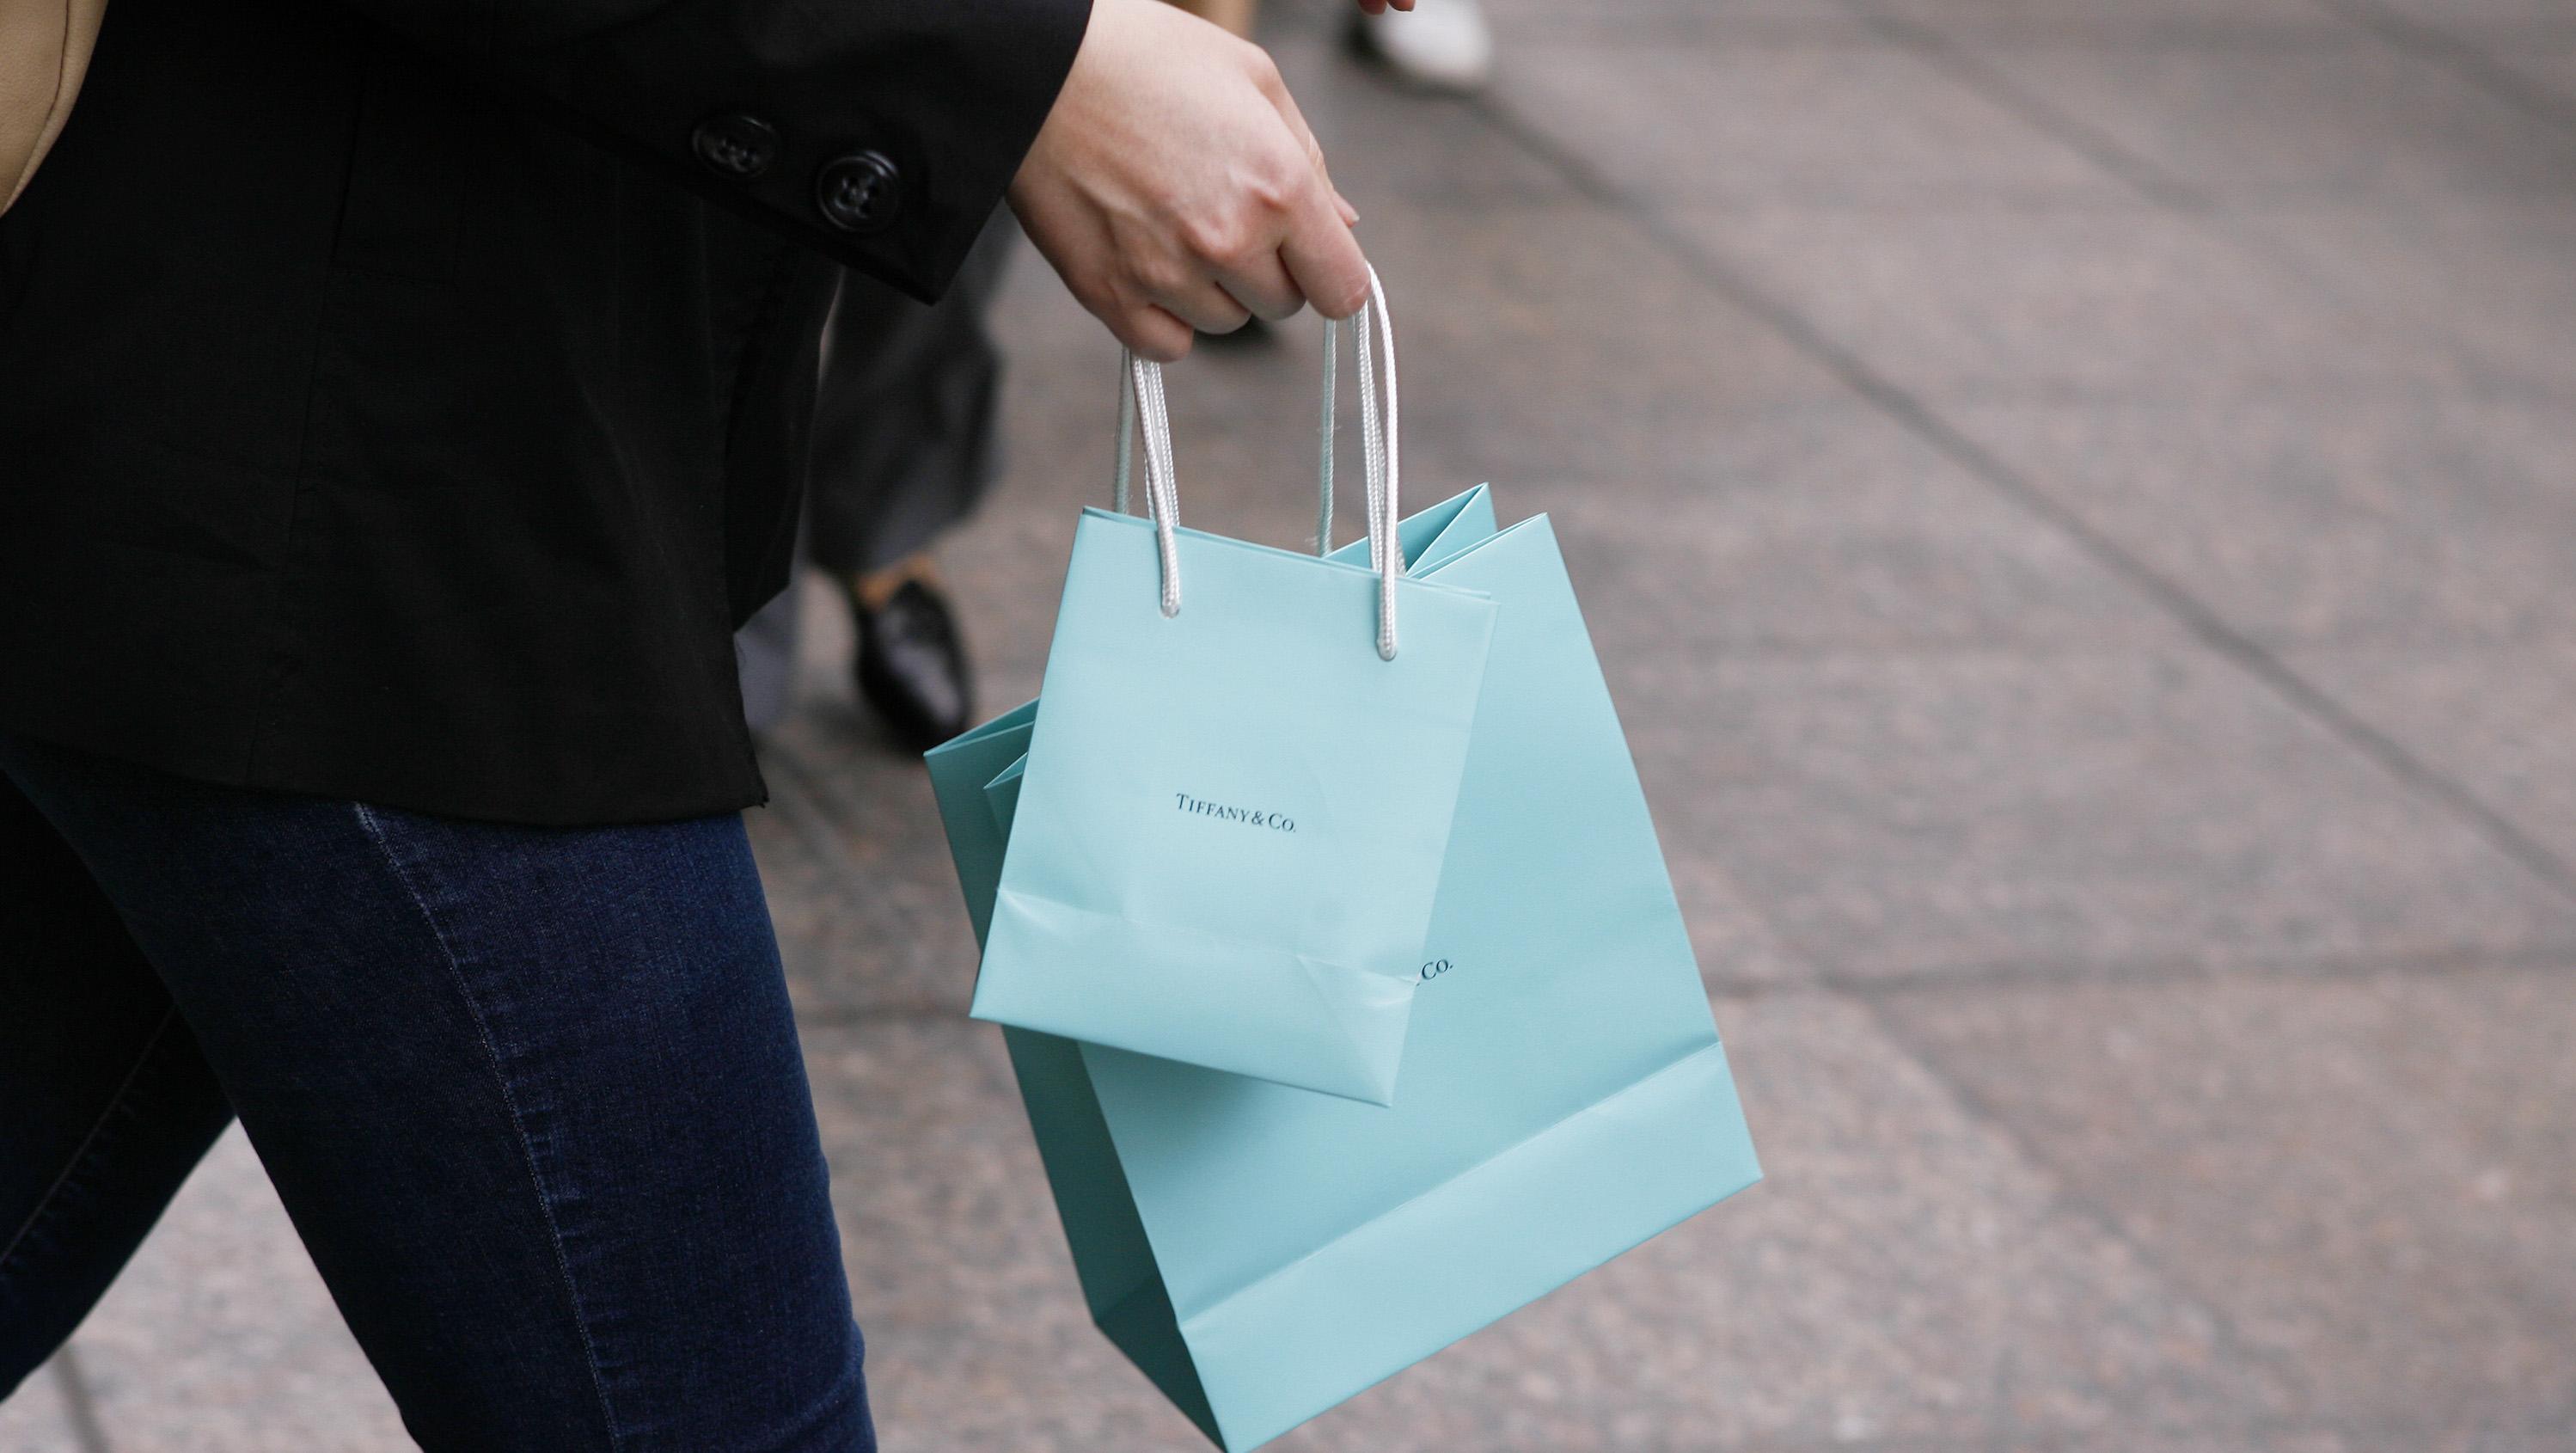 Tiffany's shopping bag